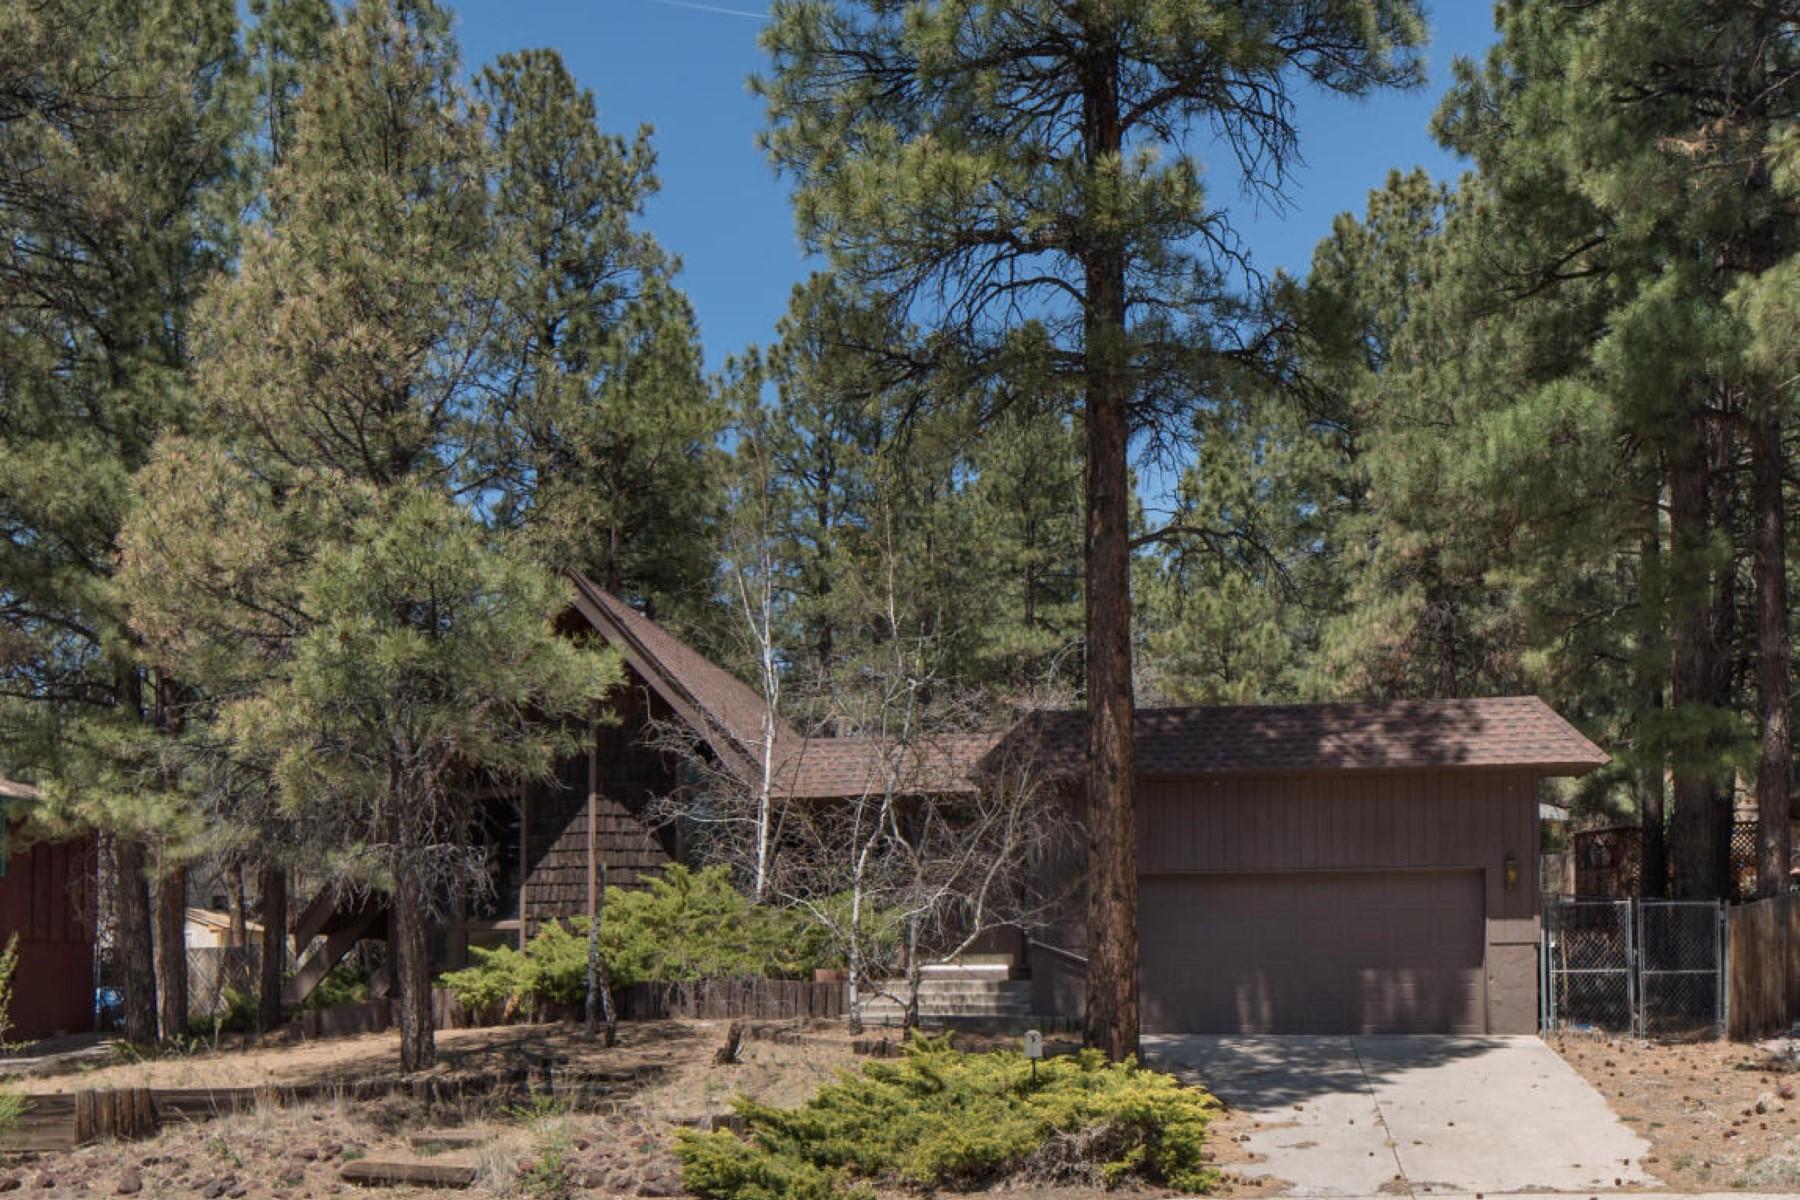 Single Family Home for Sale at Unique single story home 1500 E Linda Vista Dr Flagstaff, Arizona, 86004 United States